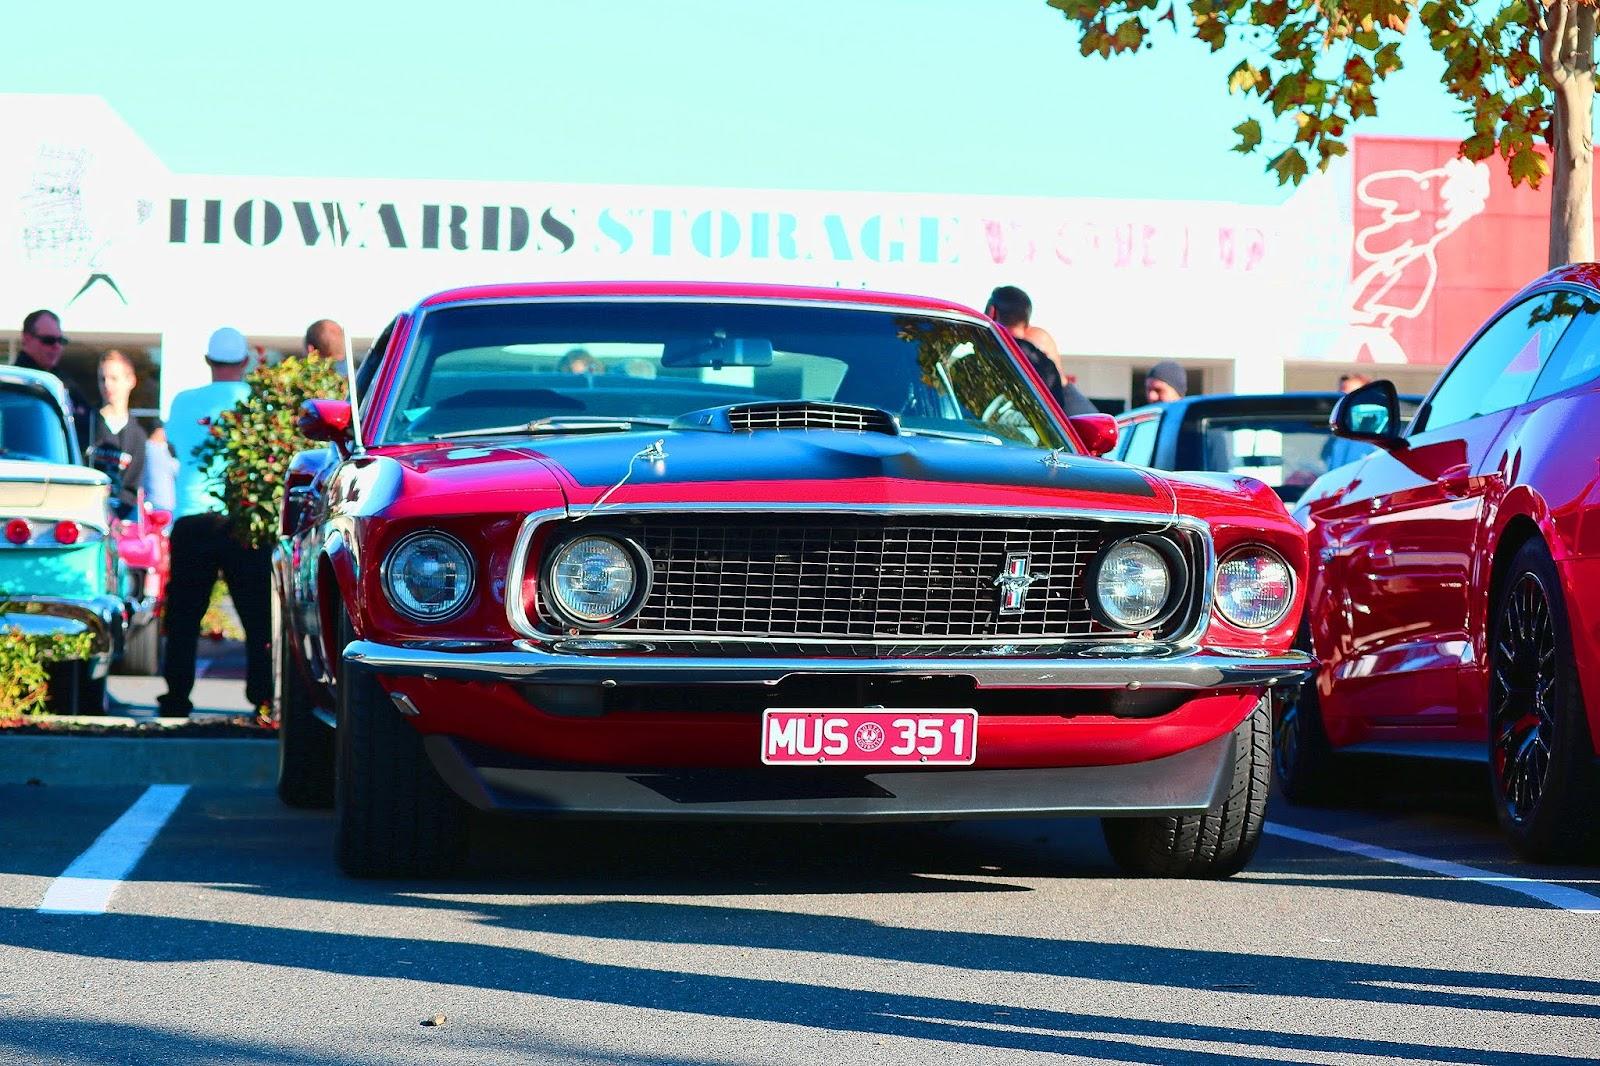 Ford Mustang 351.jpg